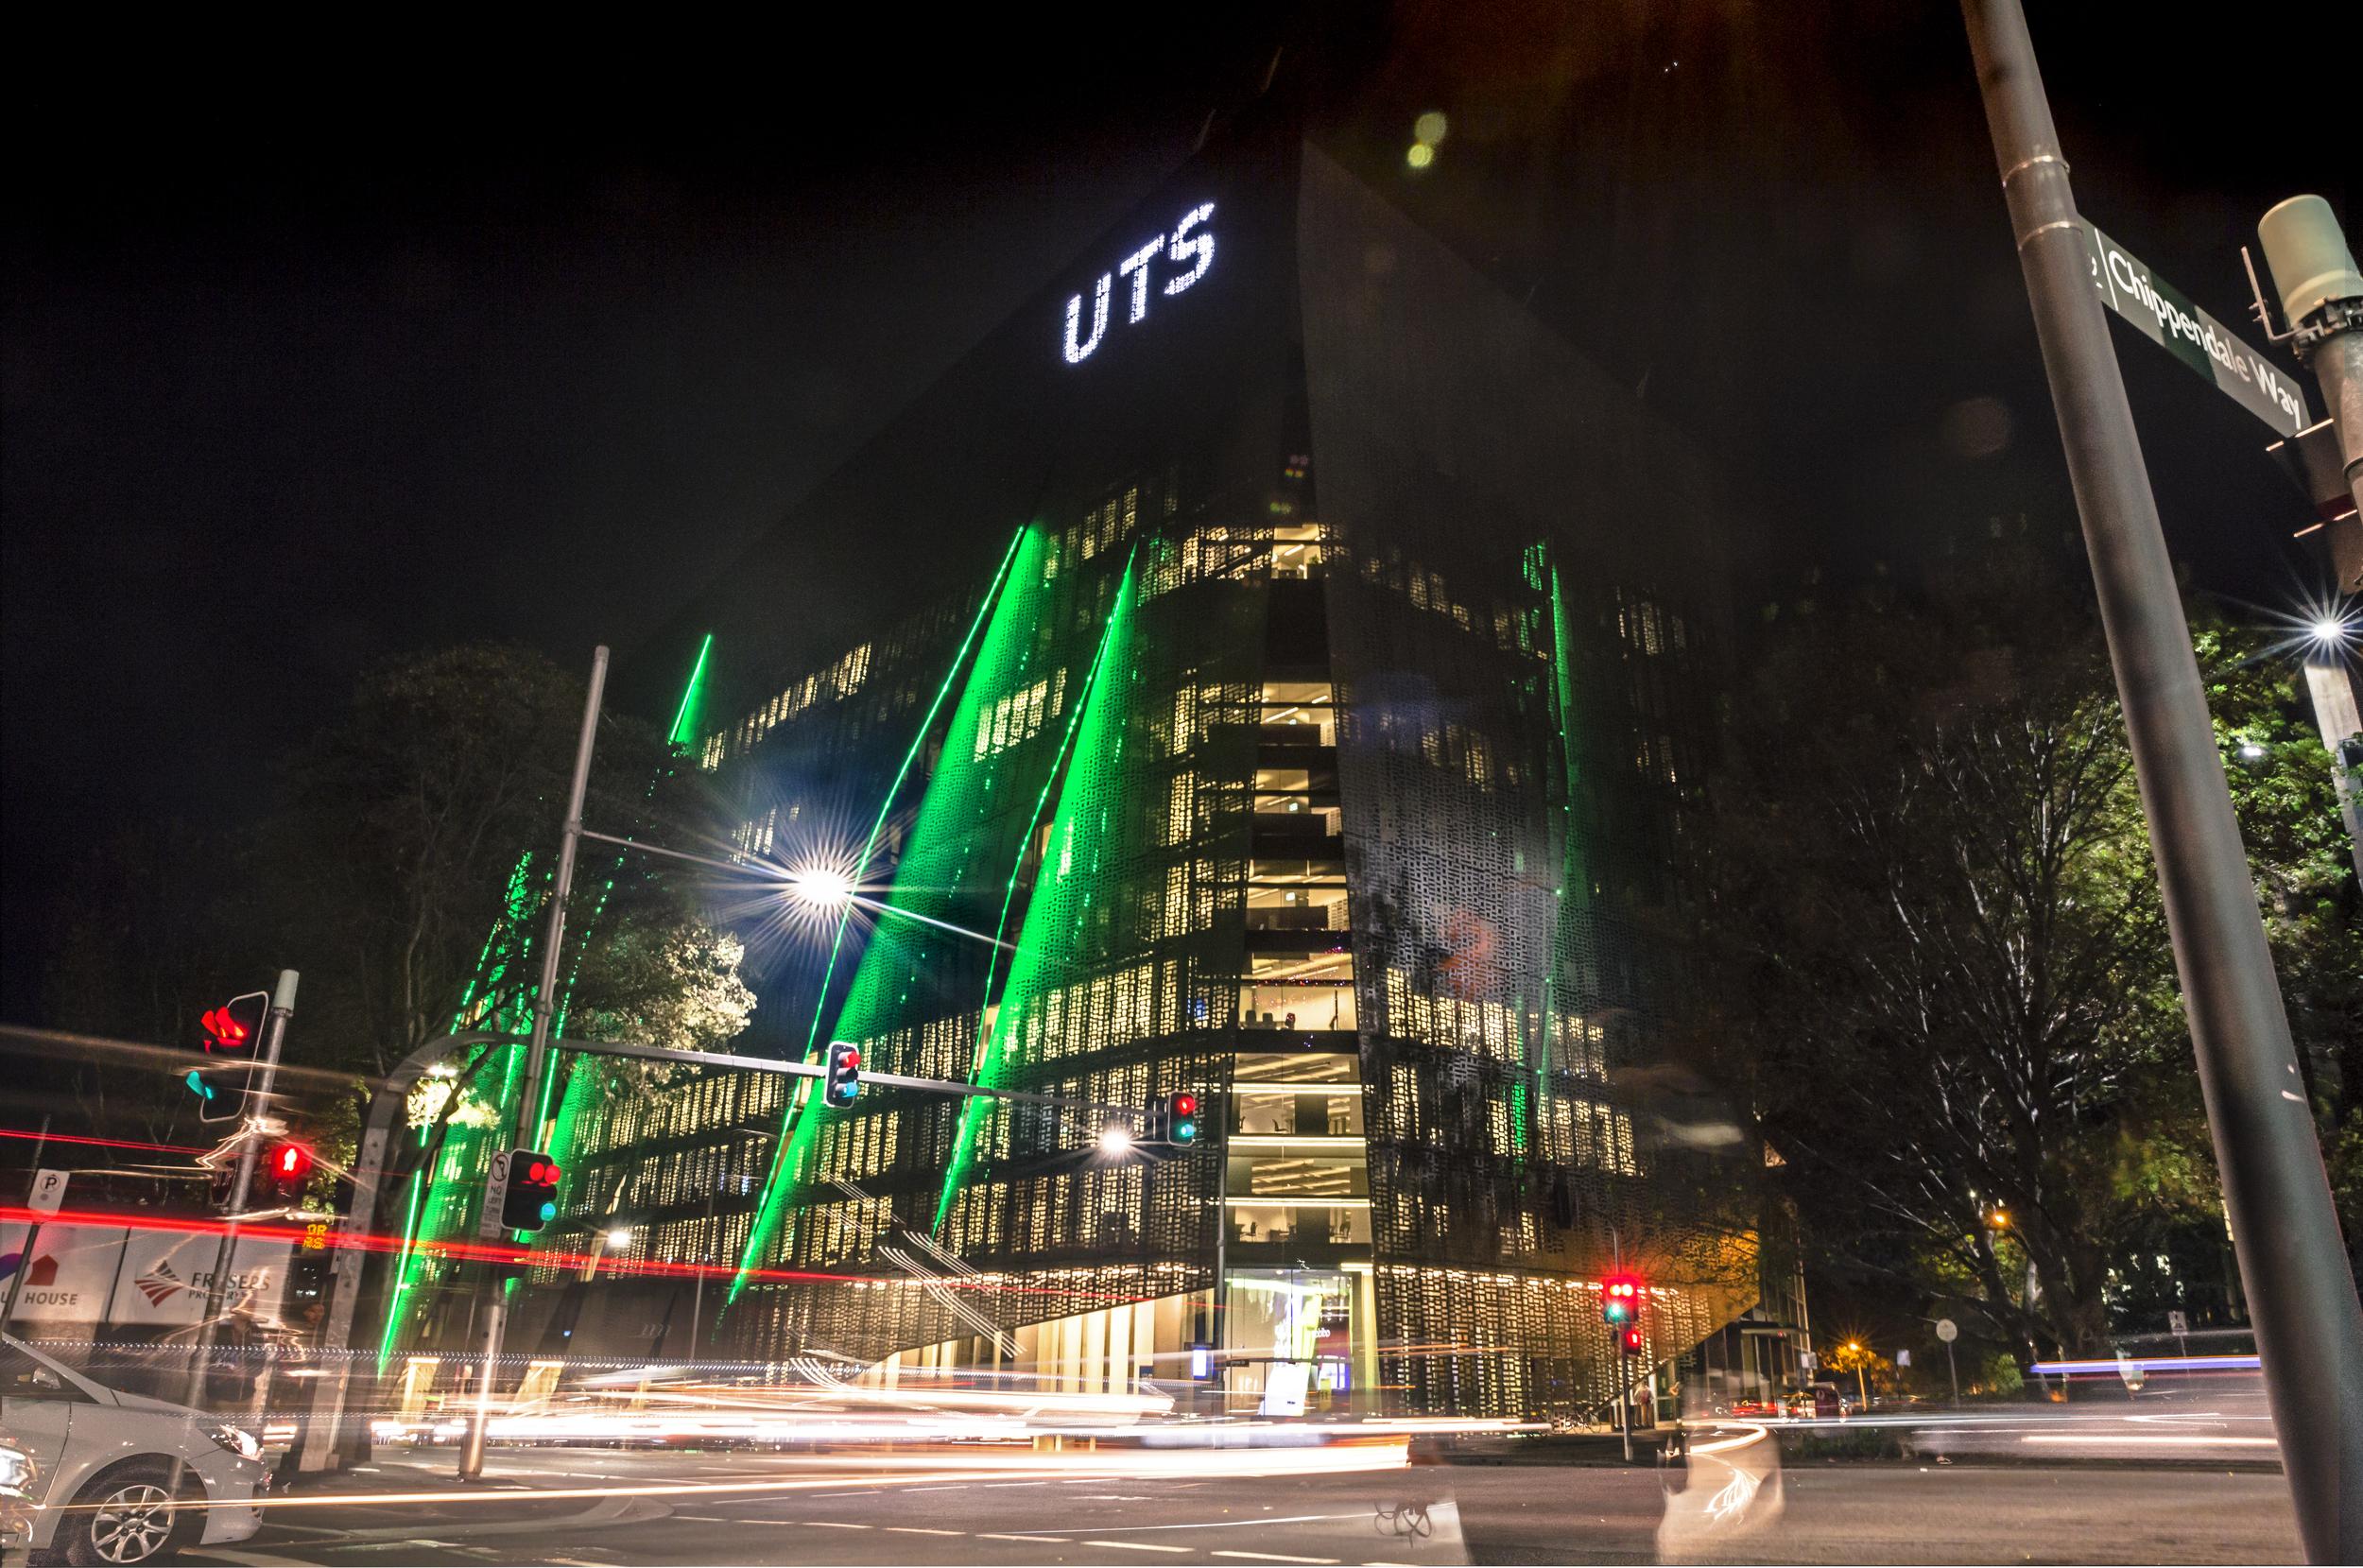 UTS Engineering building at night 3.jpg